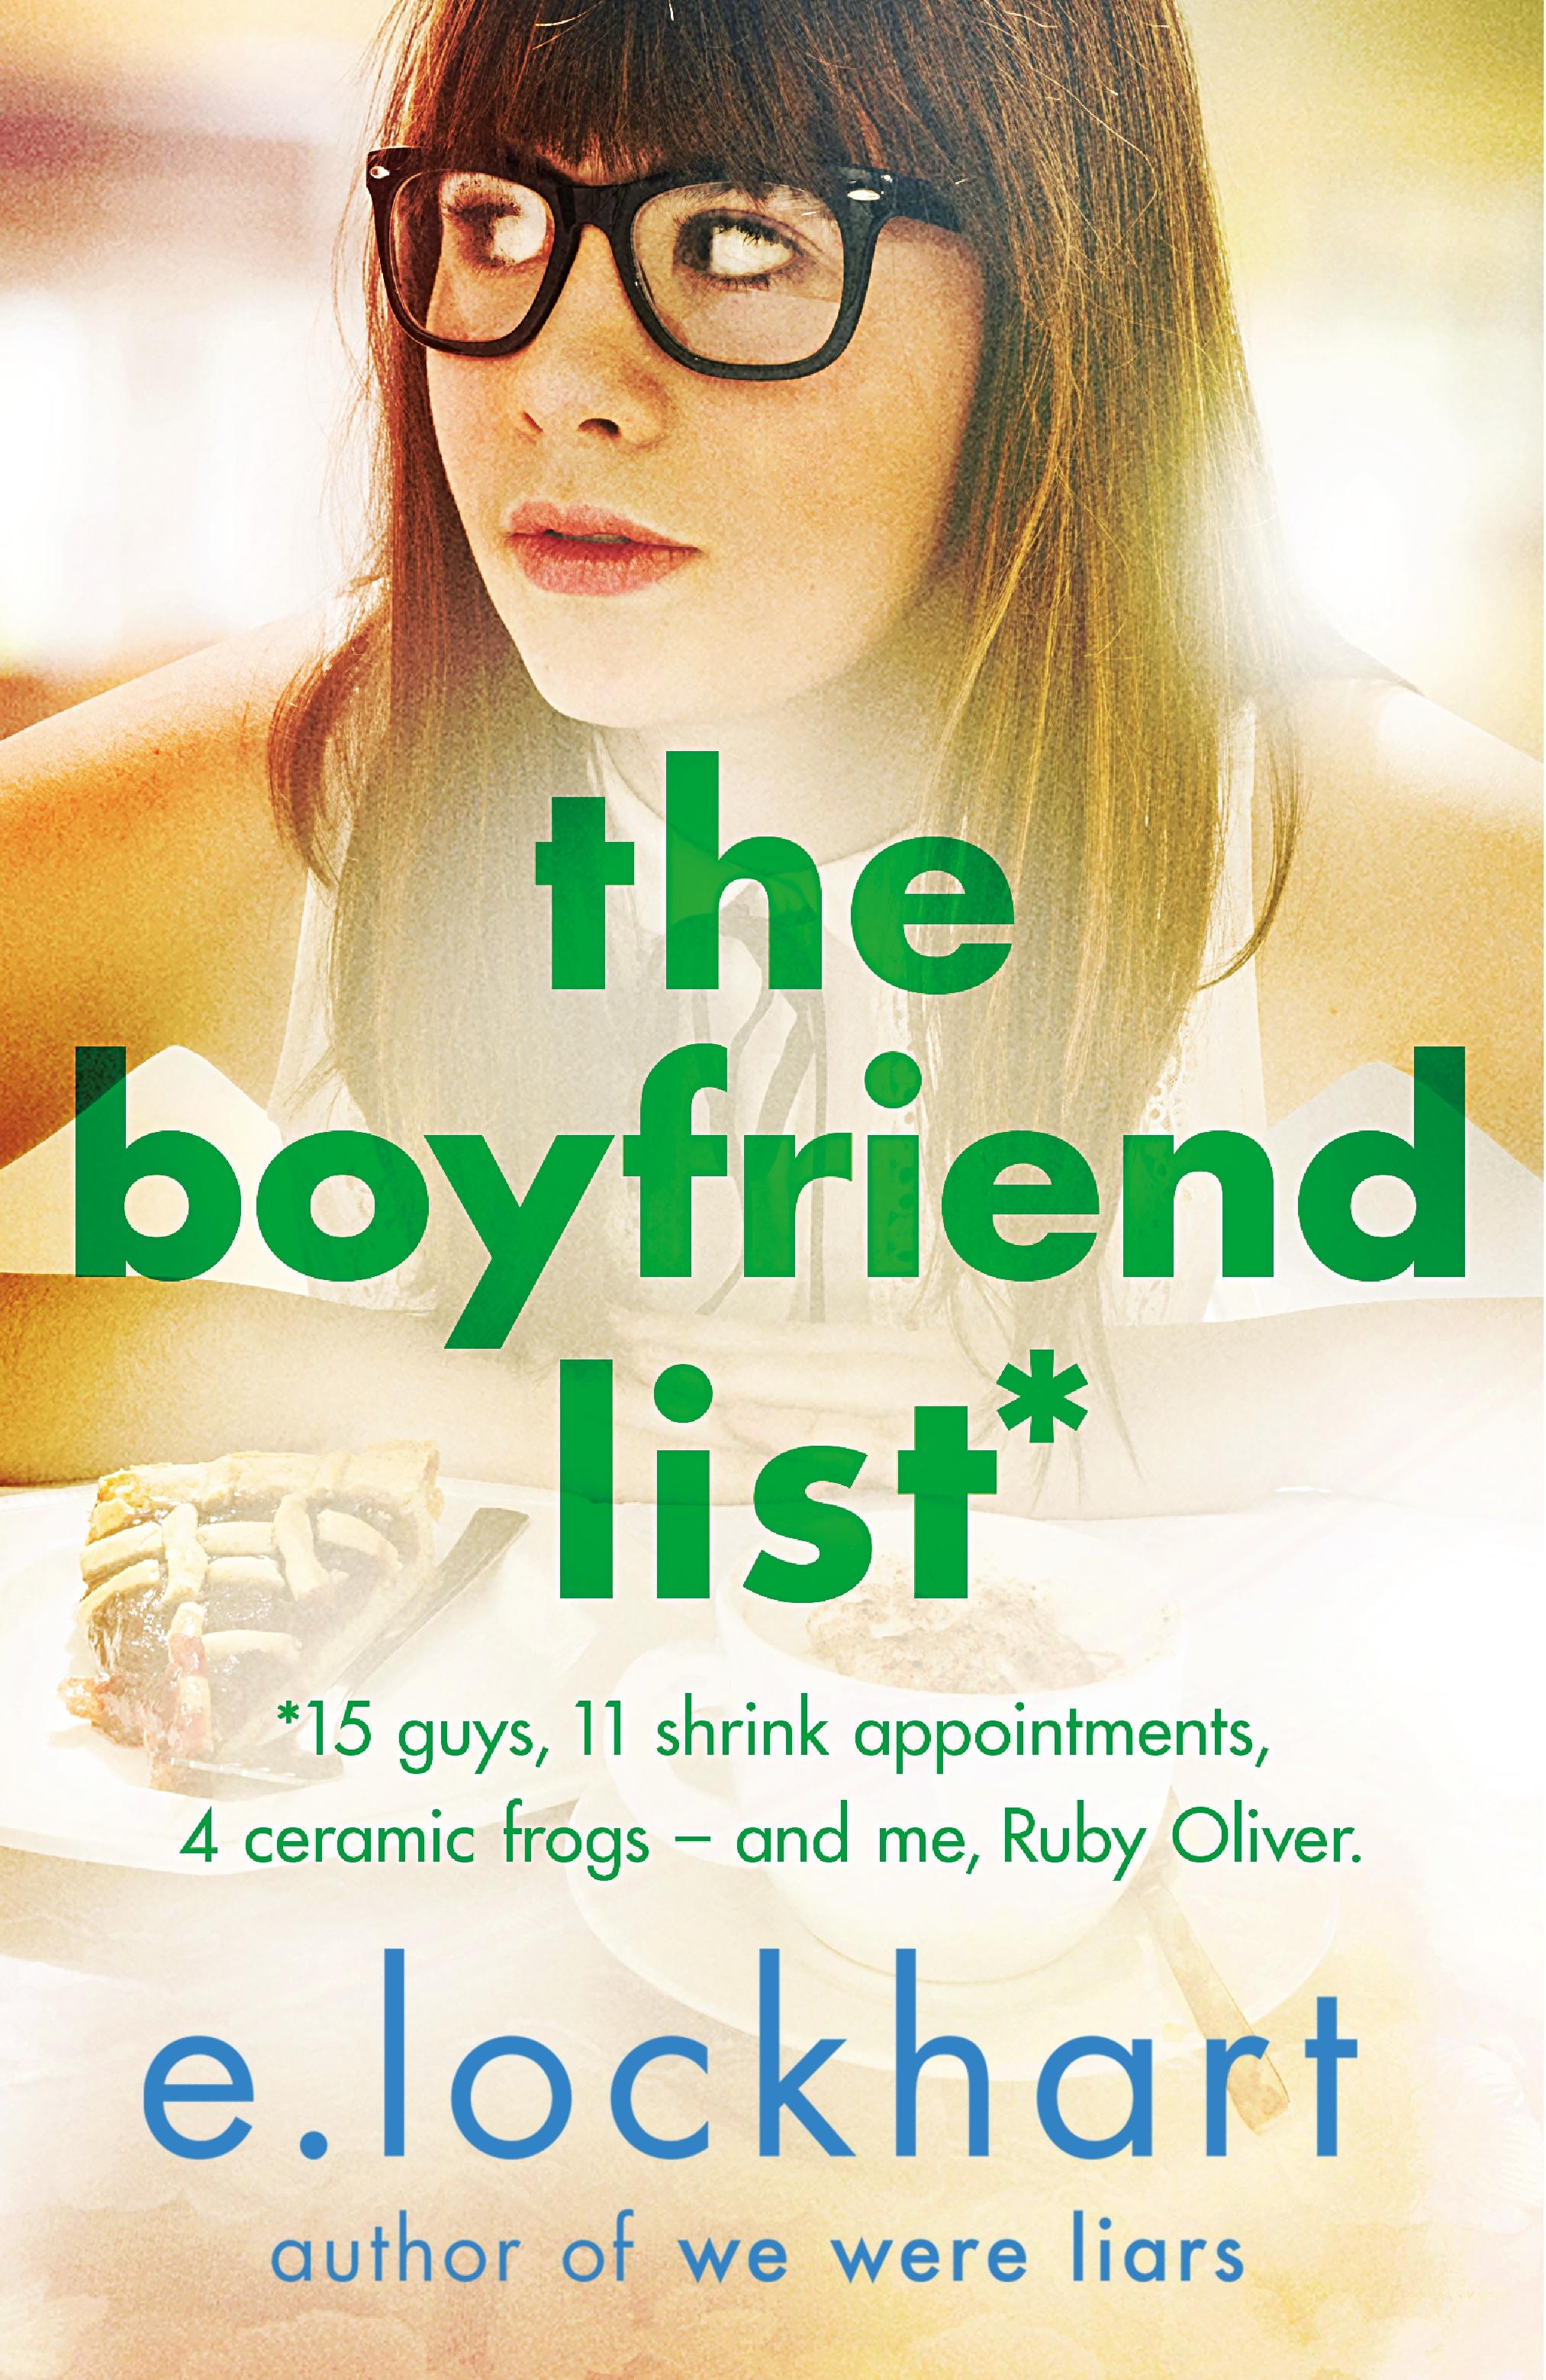 Ruby Oliver 1: The Boyfriend List by E. LockhartEmily Jenkins